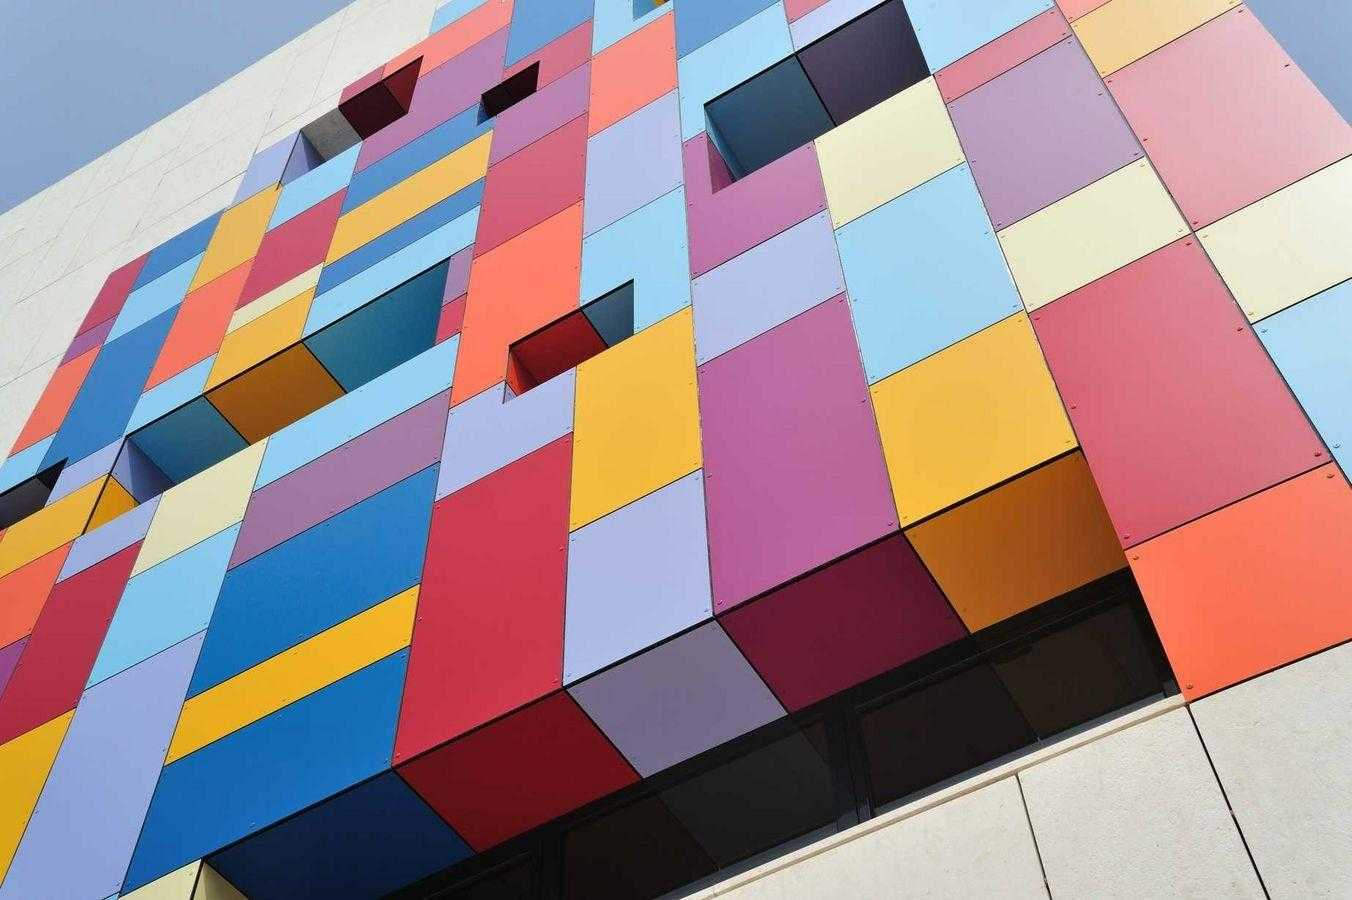 Alumunium Composite Panel pada fasad bangunan (Sumber: www.kmldesignerfinishes.com)